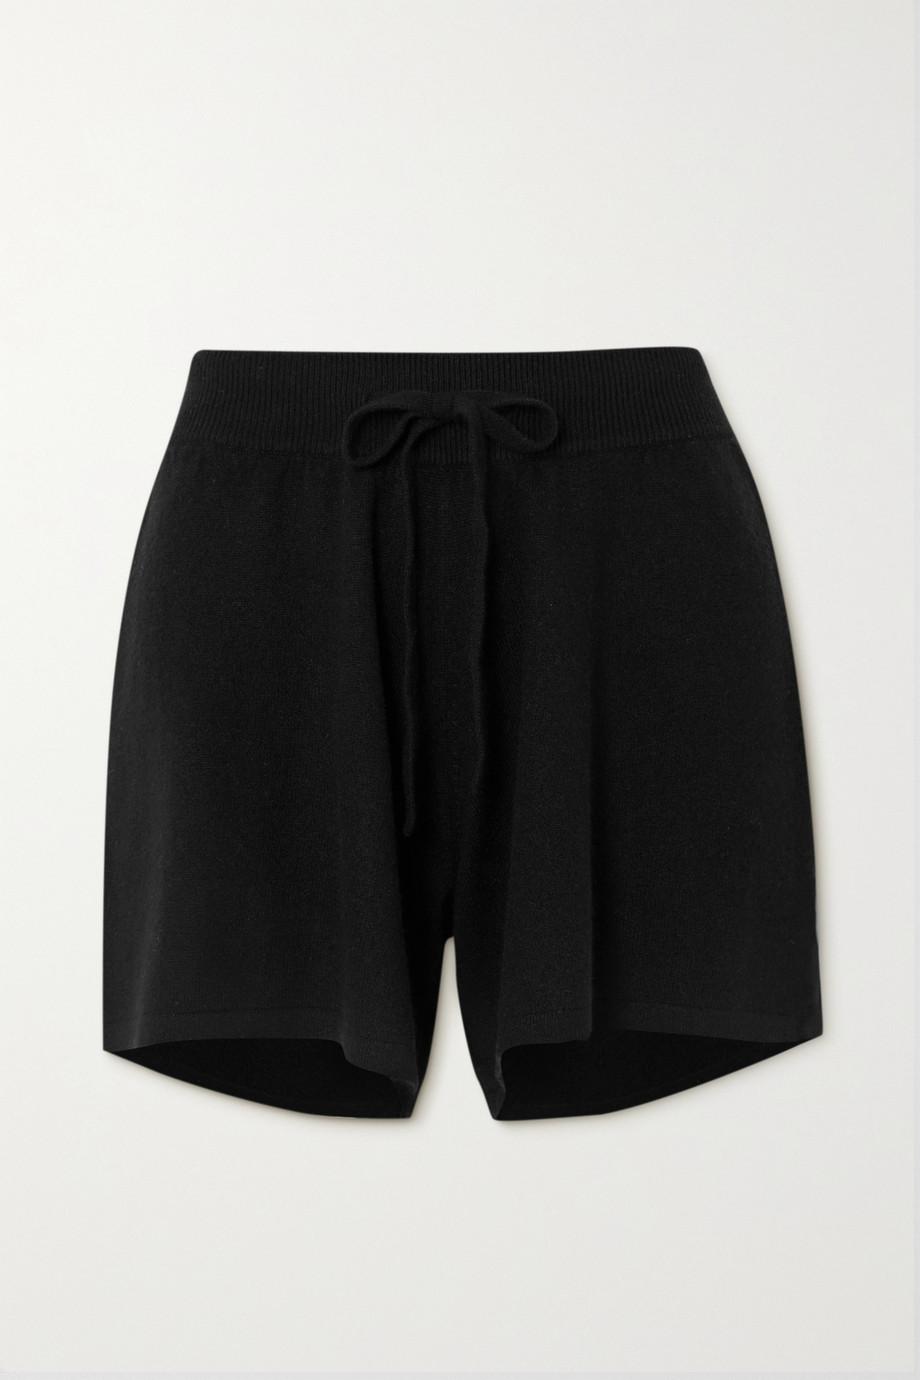 Lisa Yang Gio Shorts aus Kaschmir